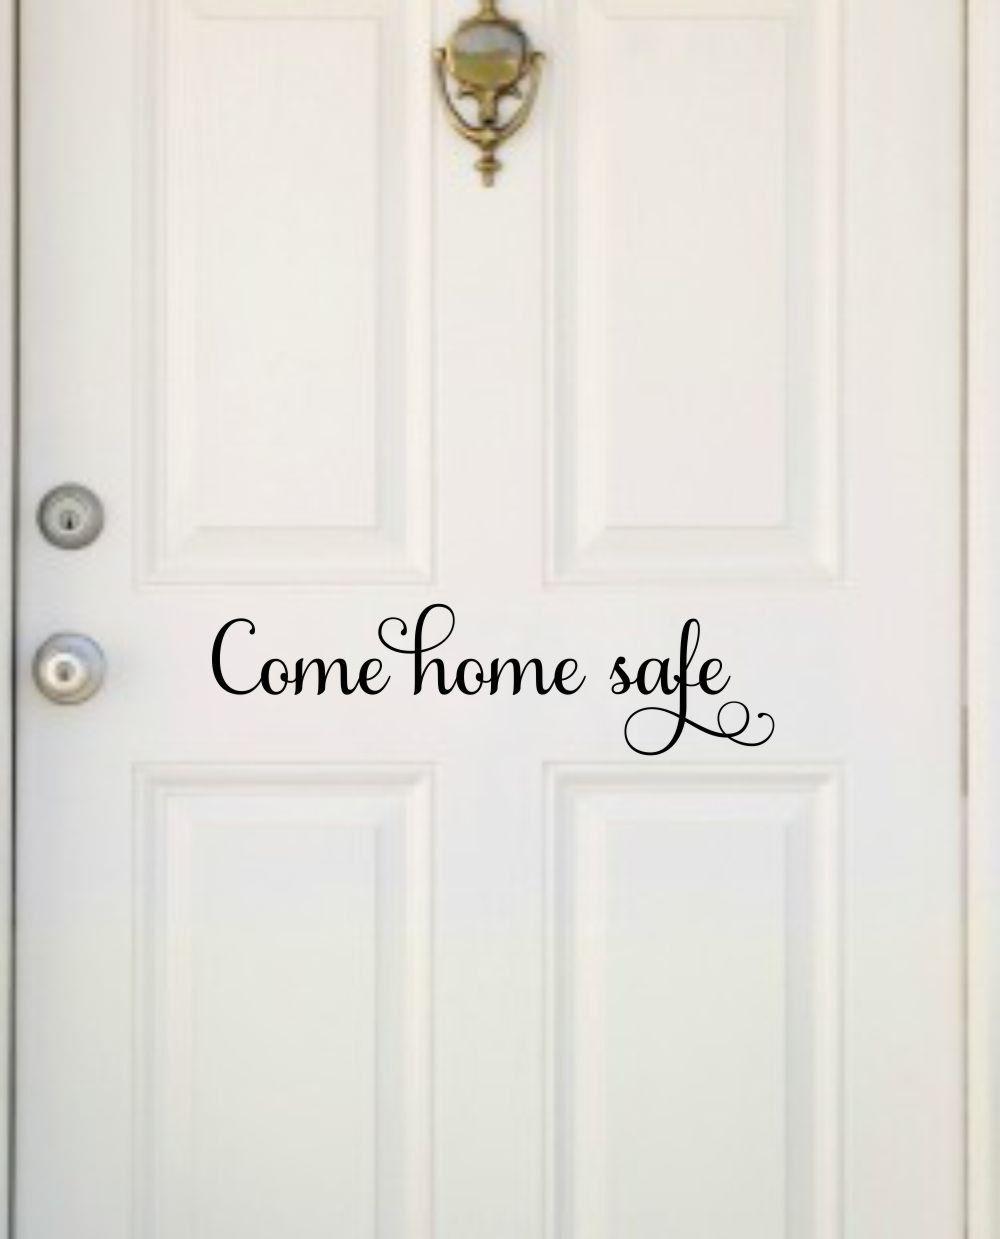 Come Home Safe Vinyl Decal Come Home Safe Decor Family Door Decal Home Safeu2026  sc 1 st  Pinterest & Come Home Safe Vinyl Decal Come Home Safe Decor Family Door Decal ... pezcame.com